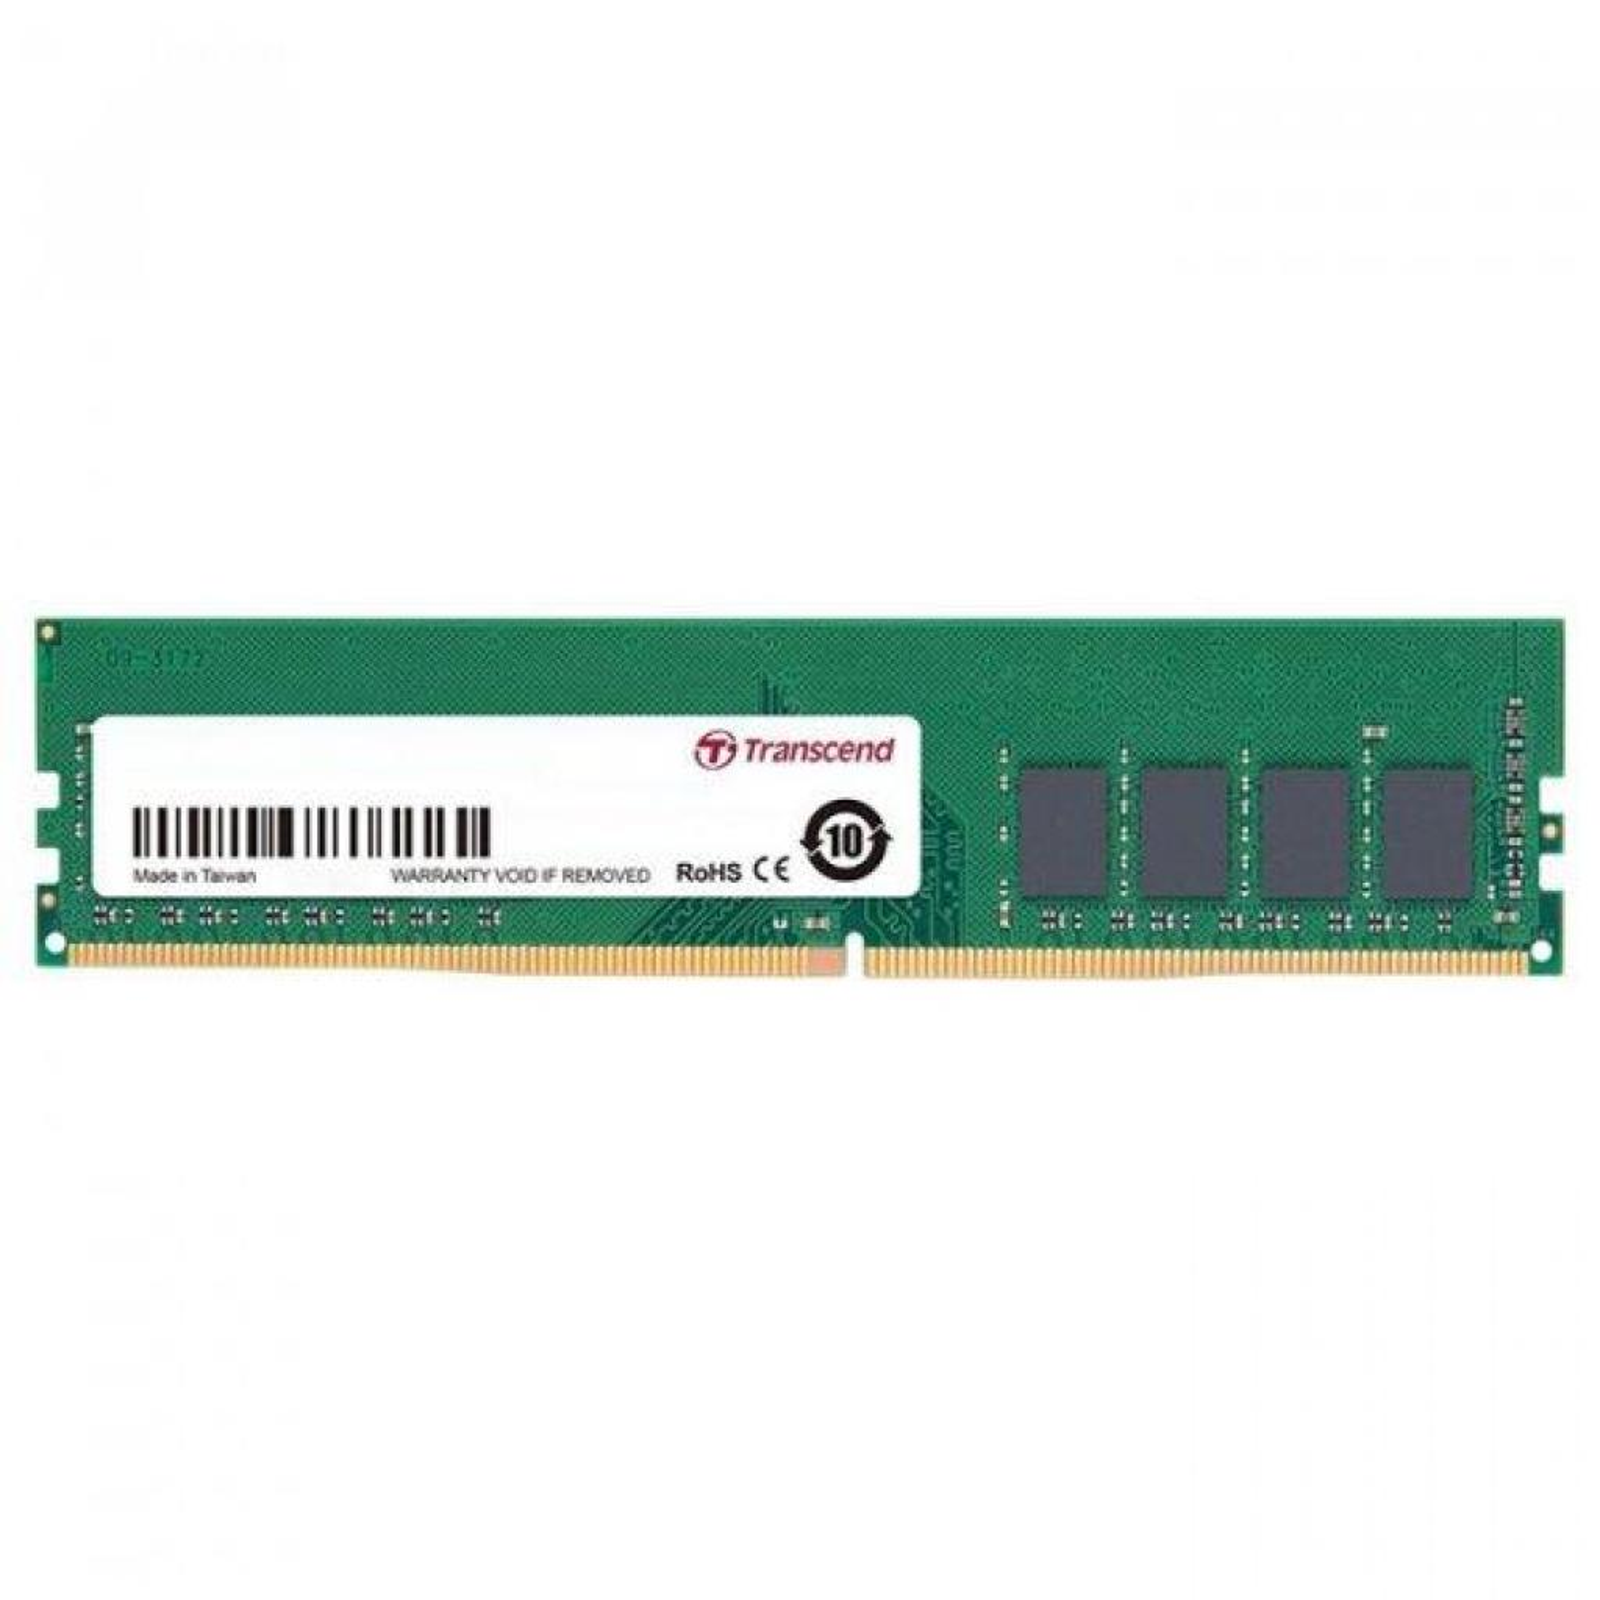 Модуль памяти для компьютера DDR4 4GB 2666 MHz Transcend (JM2666HLH-4G)